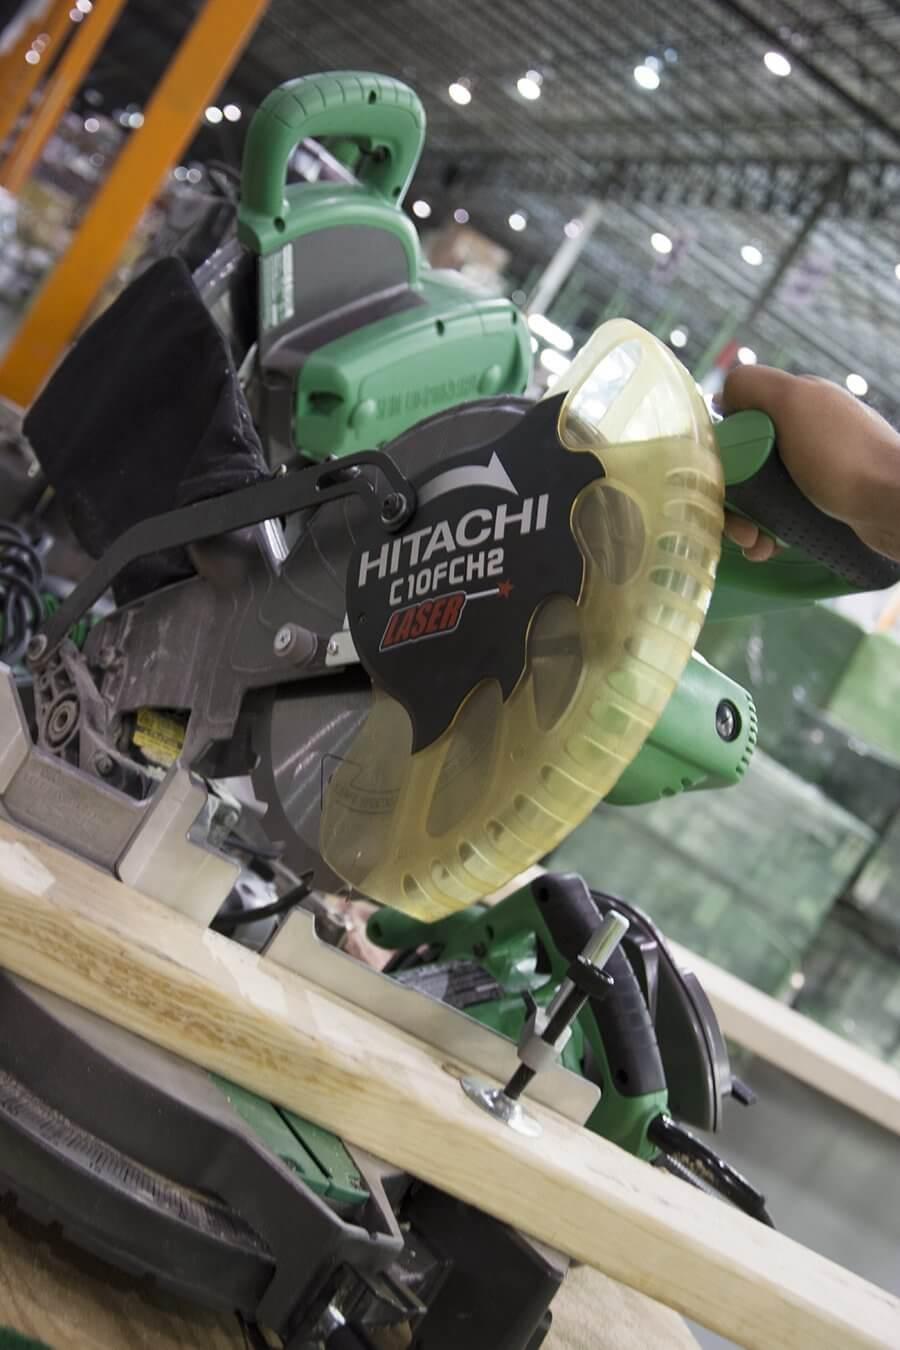 hitachi-c10fch2-miter-saw-07